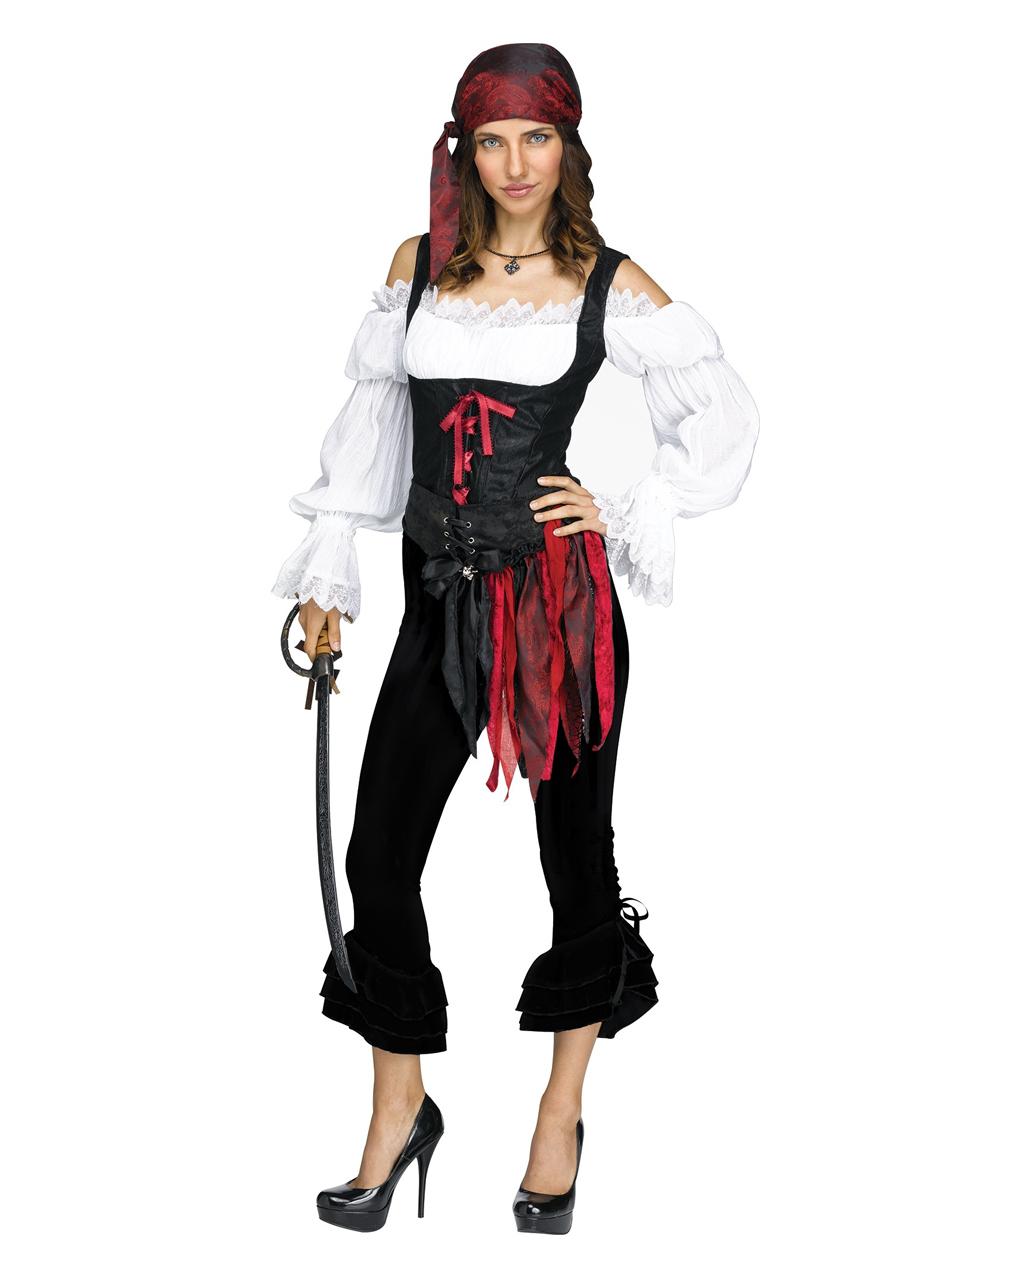 Piratin Piraten Damen Piratenbraut Fasching Karneval Kostüm Seeräuberin schwarz